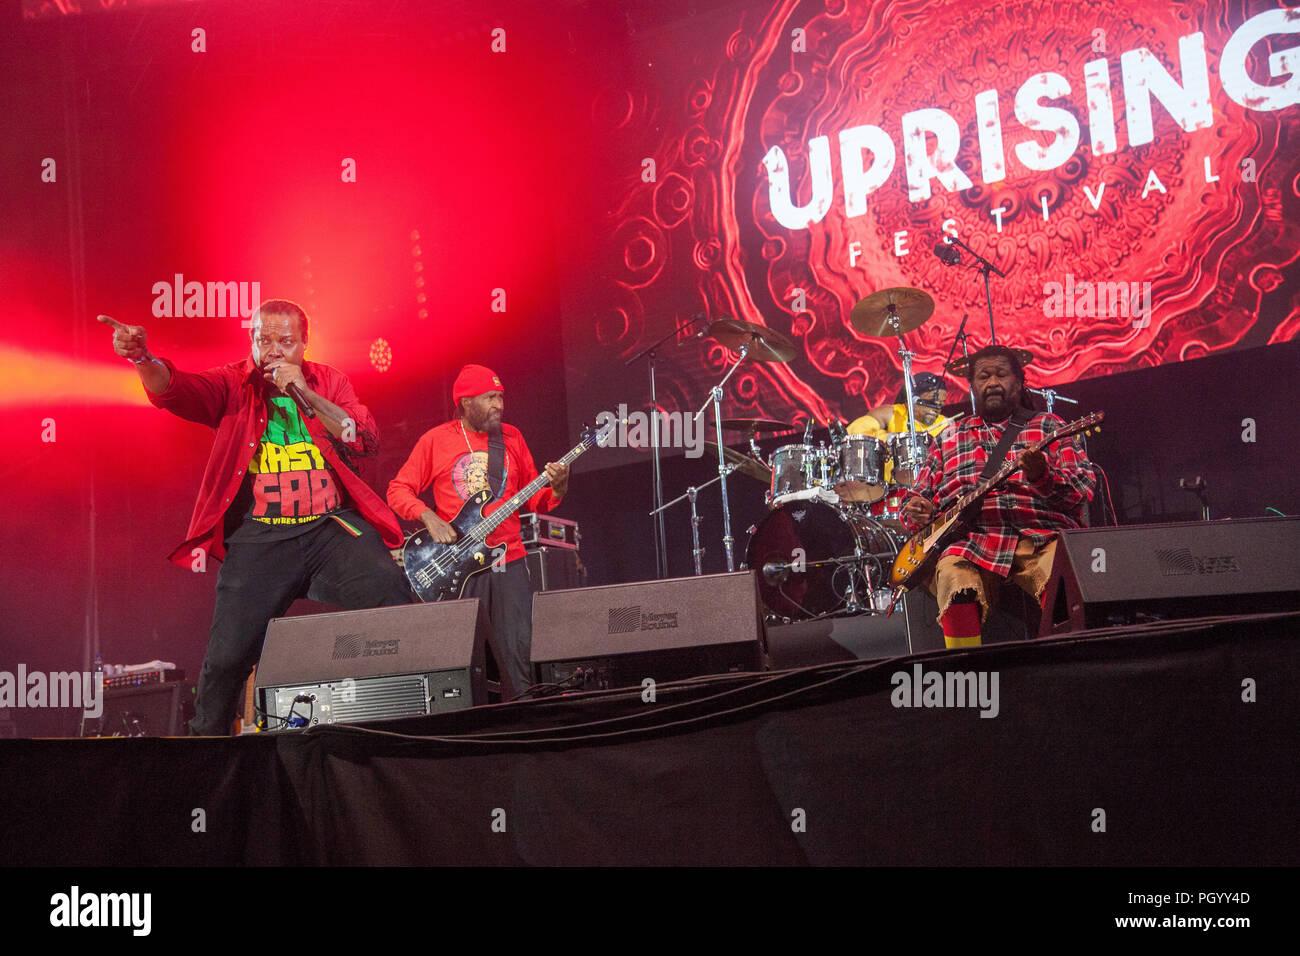 Bratislava, Slovakia. 25th August, 2018. Jamaican reggae band Inner Circle performs at Uprising Music Festival. - Stock Image